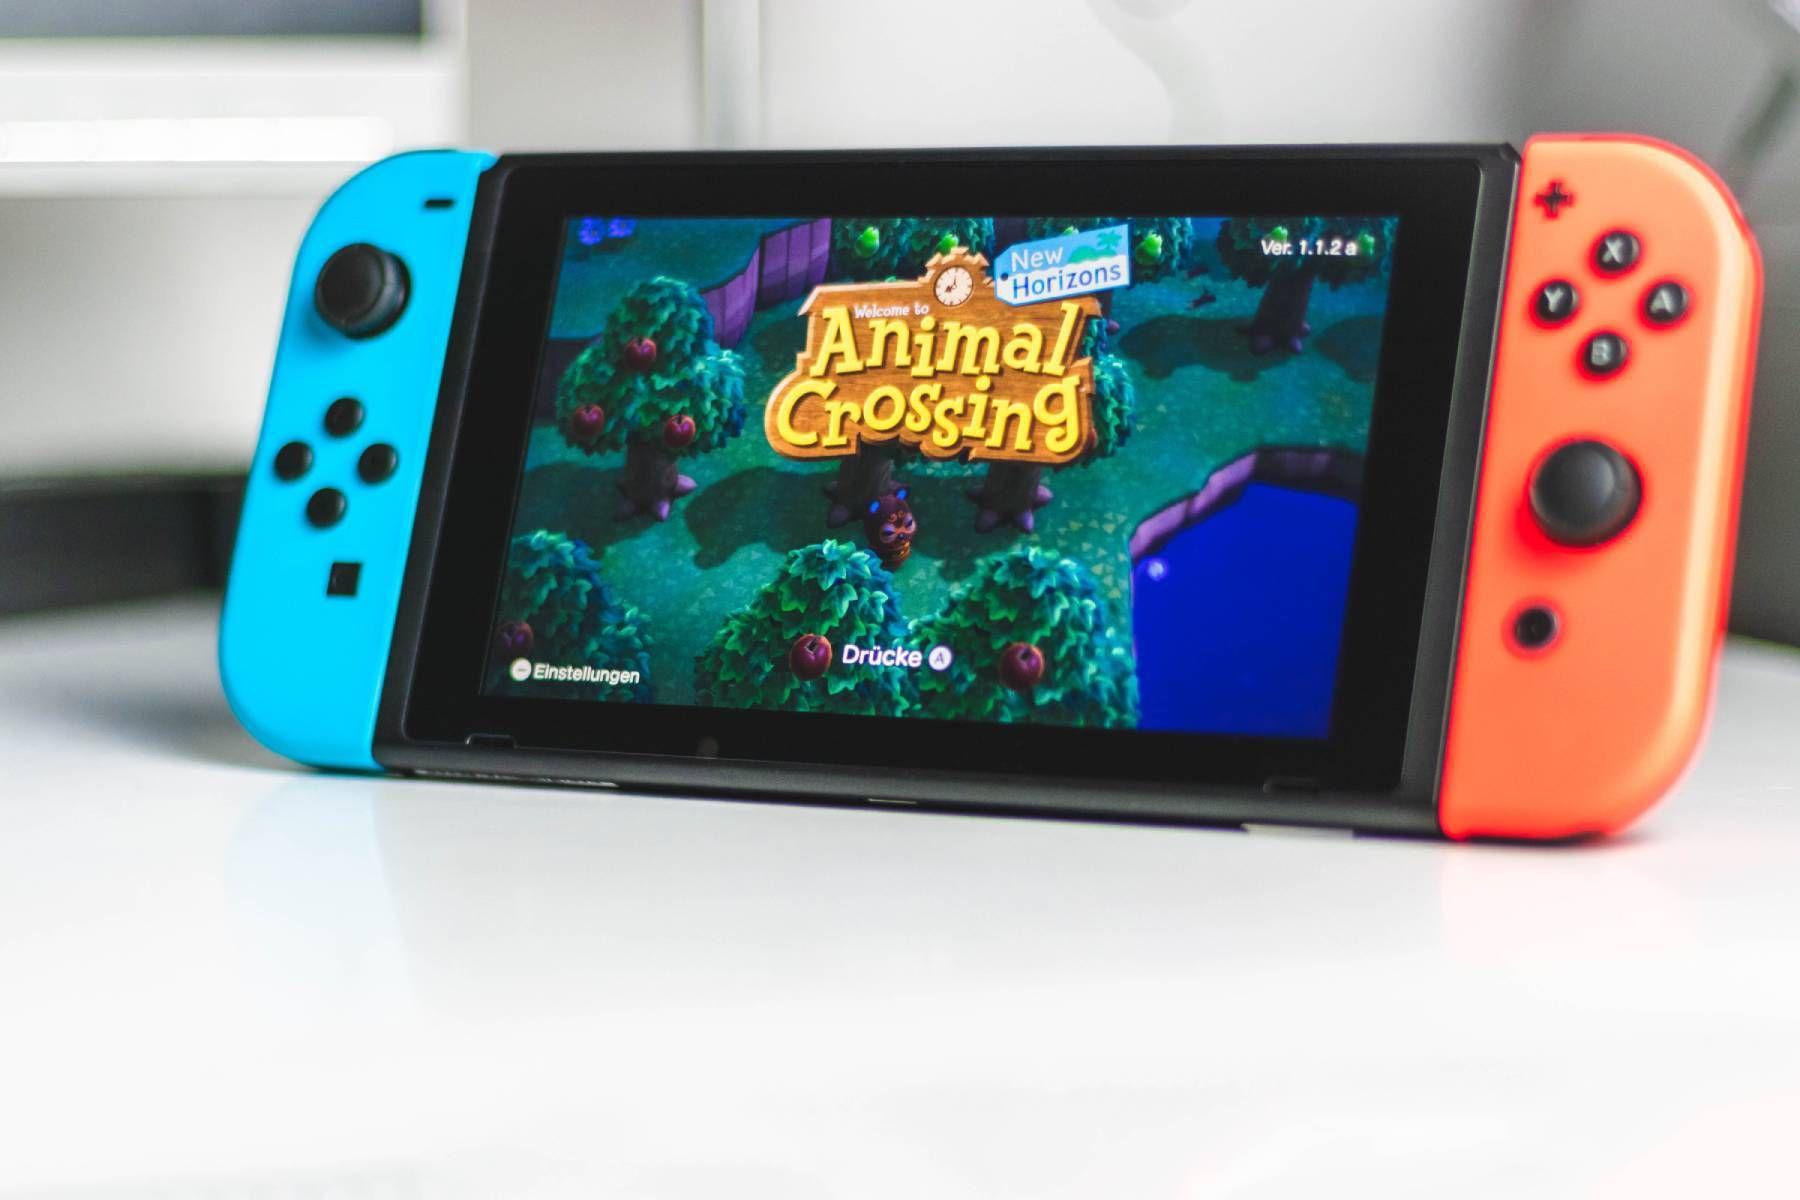 Une Nintendo Switch allumée sur le jeu Animal Crossing